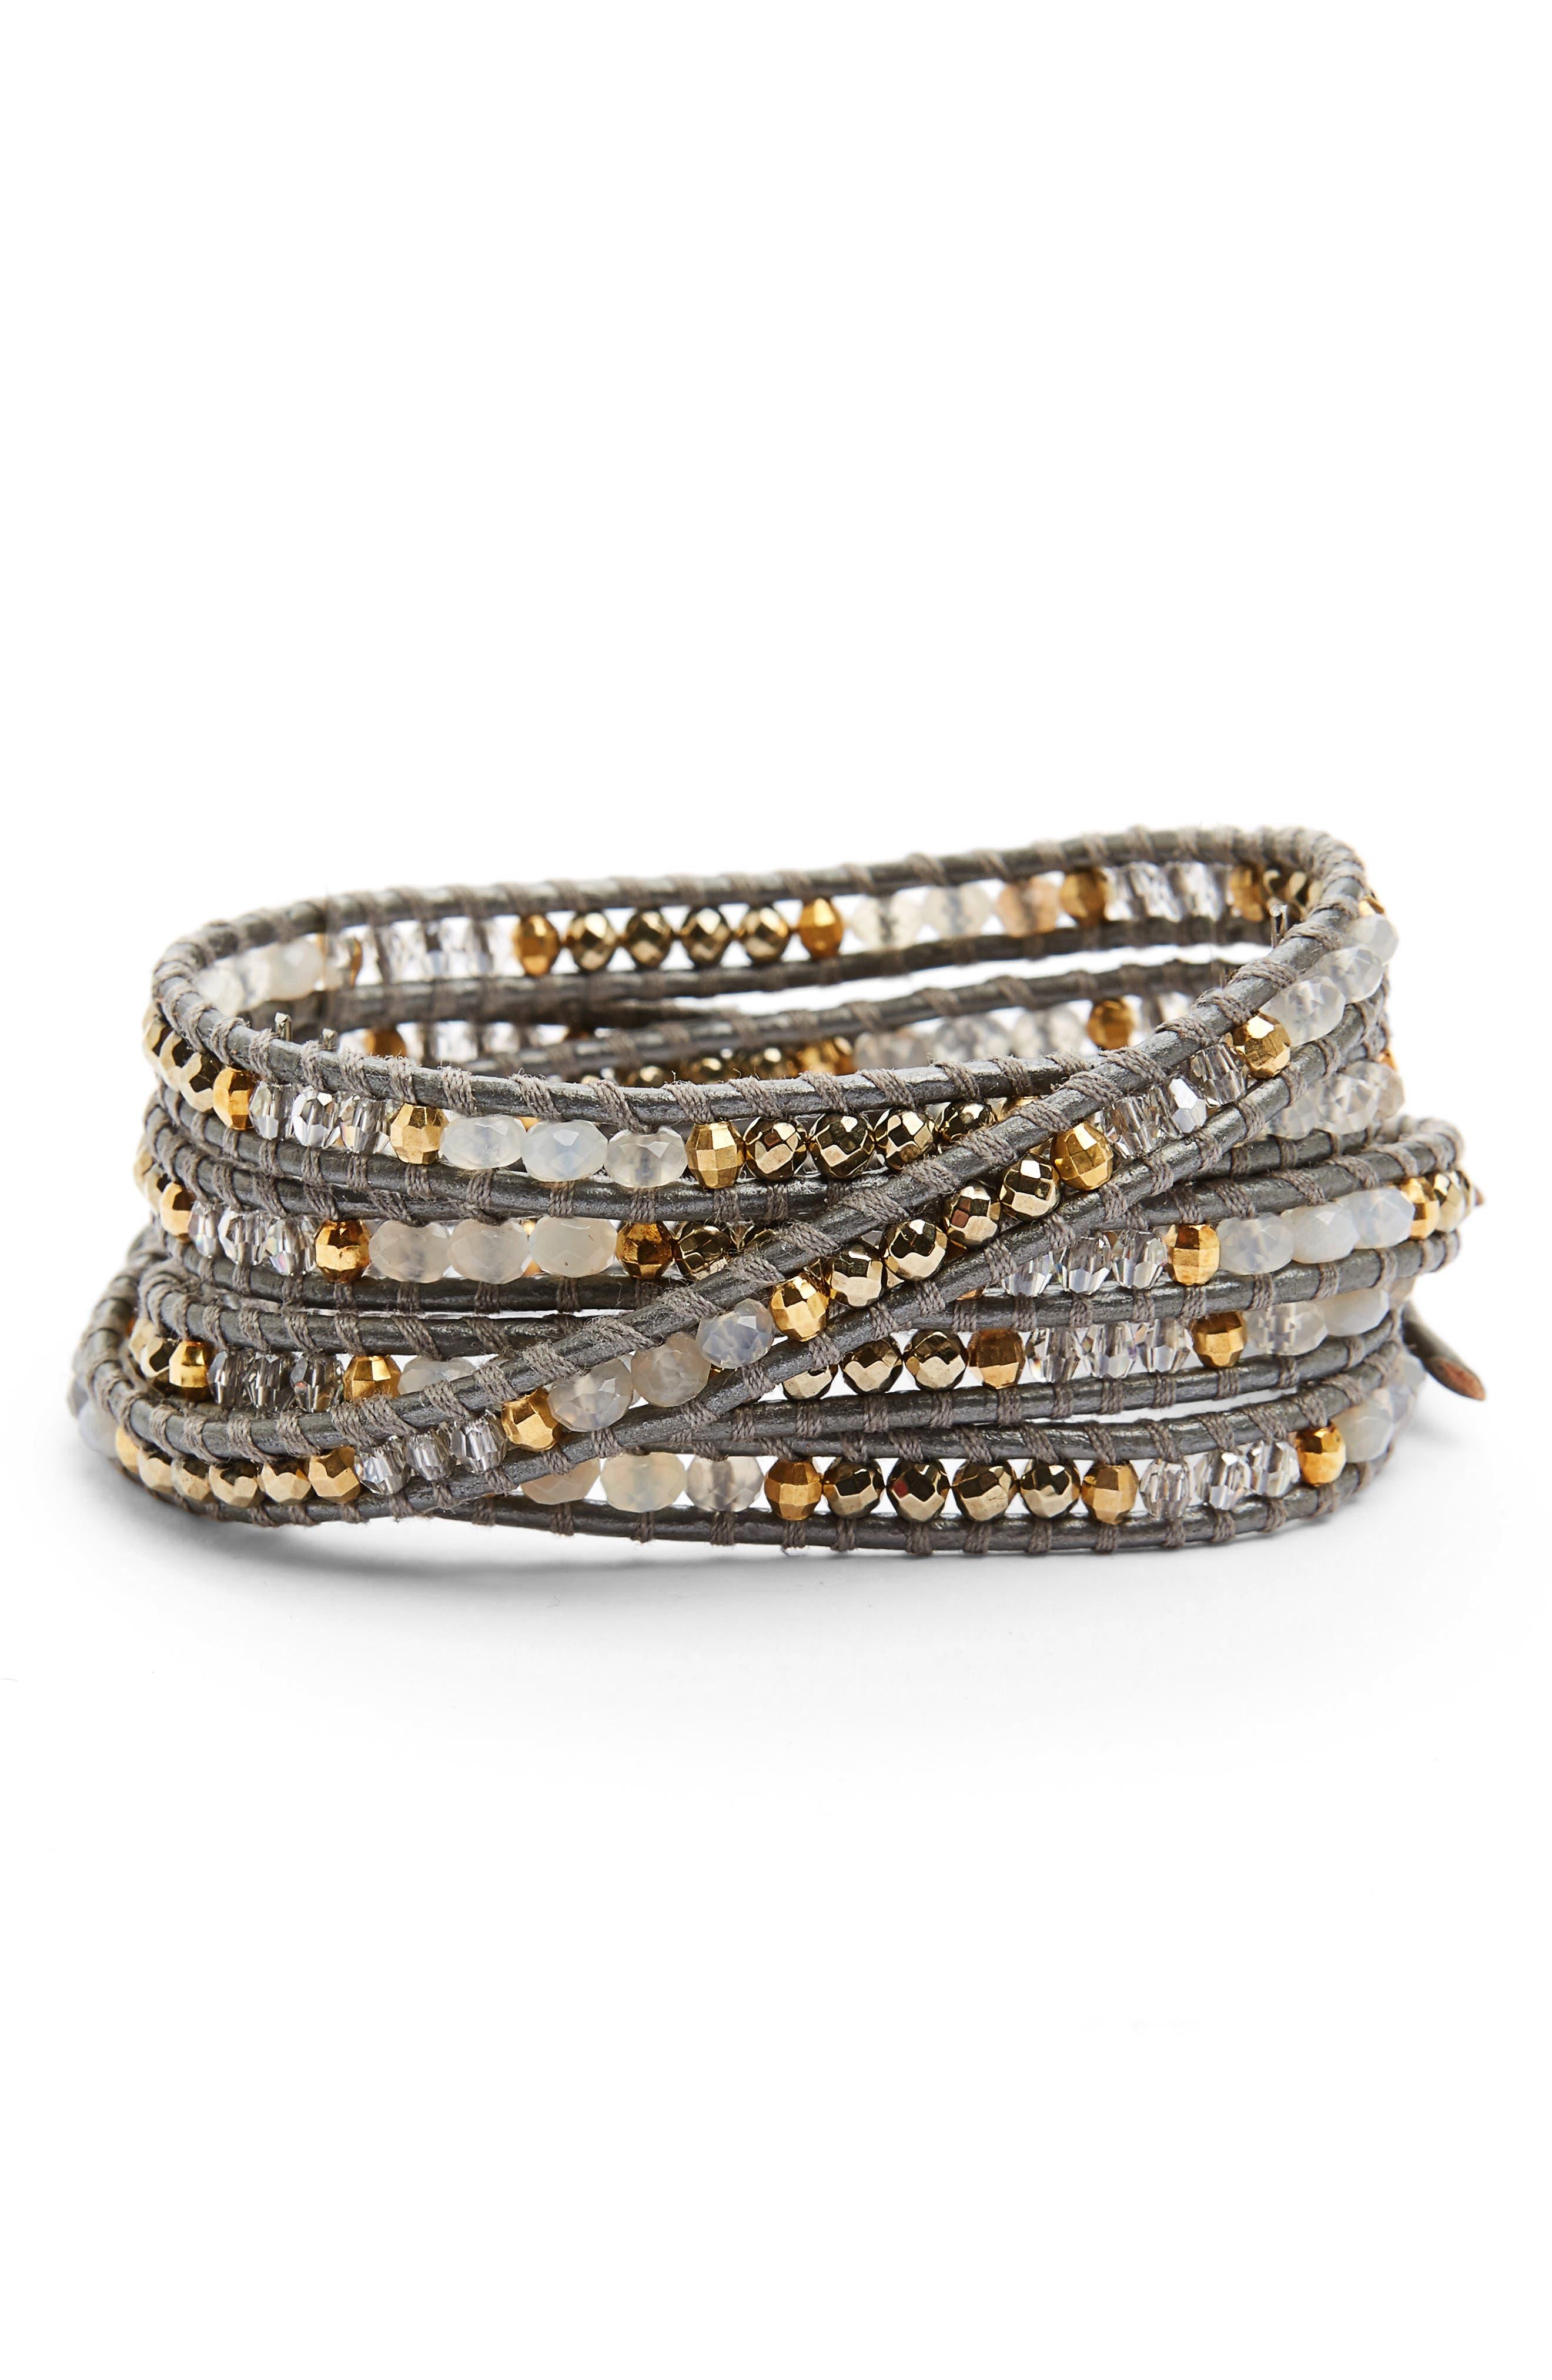 Semiprecious Stone Leather Wrap Bracelet,                             Main thumbnail 1, color,